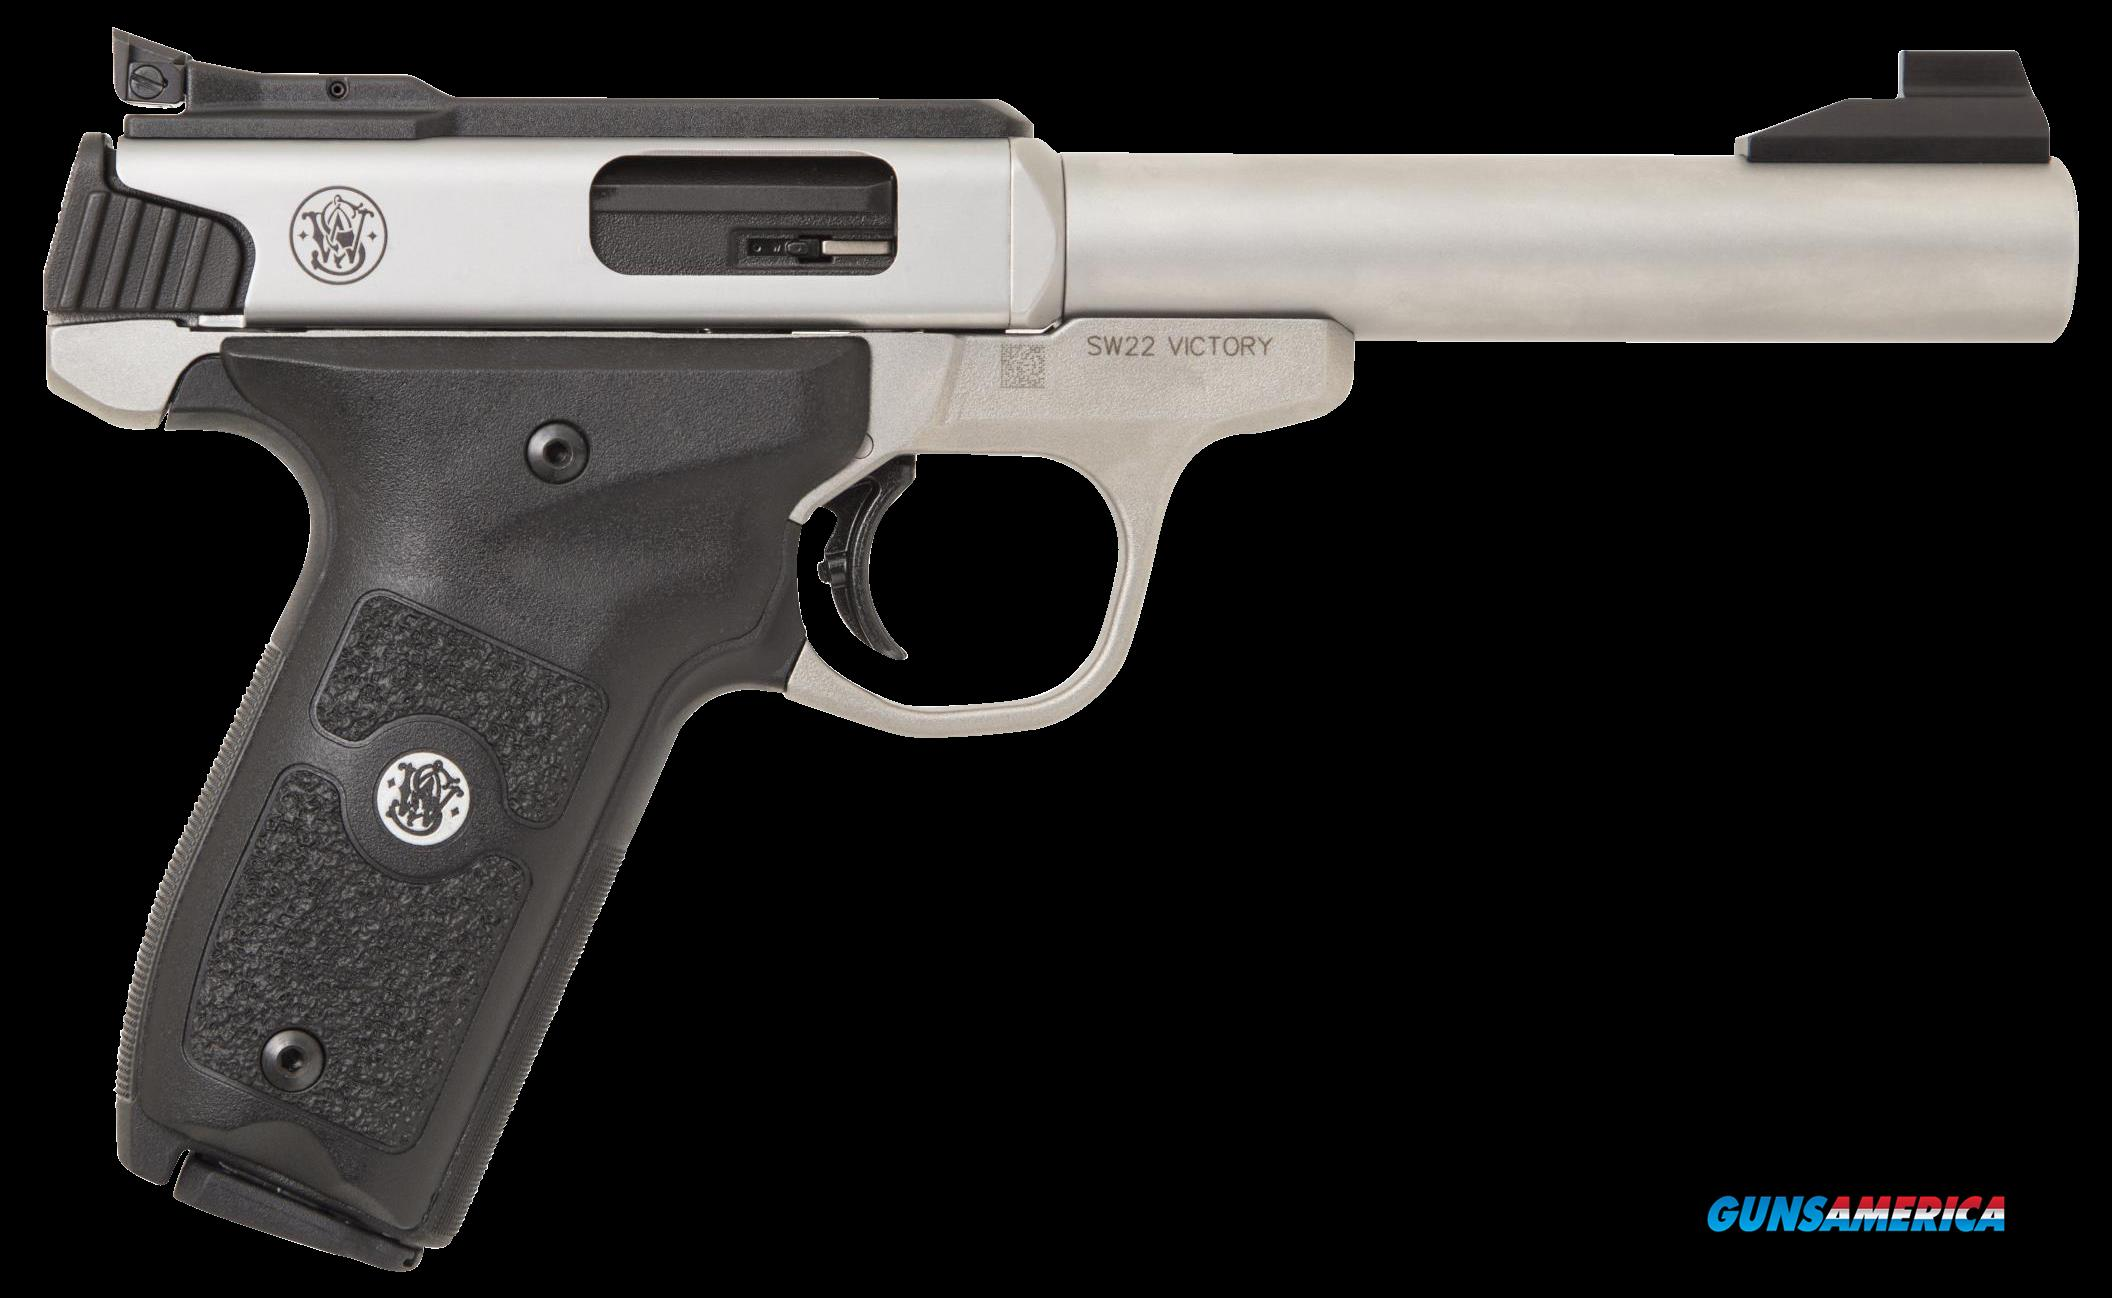 Smith & Wesson Sw22, S&w*victory   11536  22lr 5.5 10r Tgt Ss *ma*  Guns > Pistols > 1911 Pistol Copies (non-Colt)